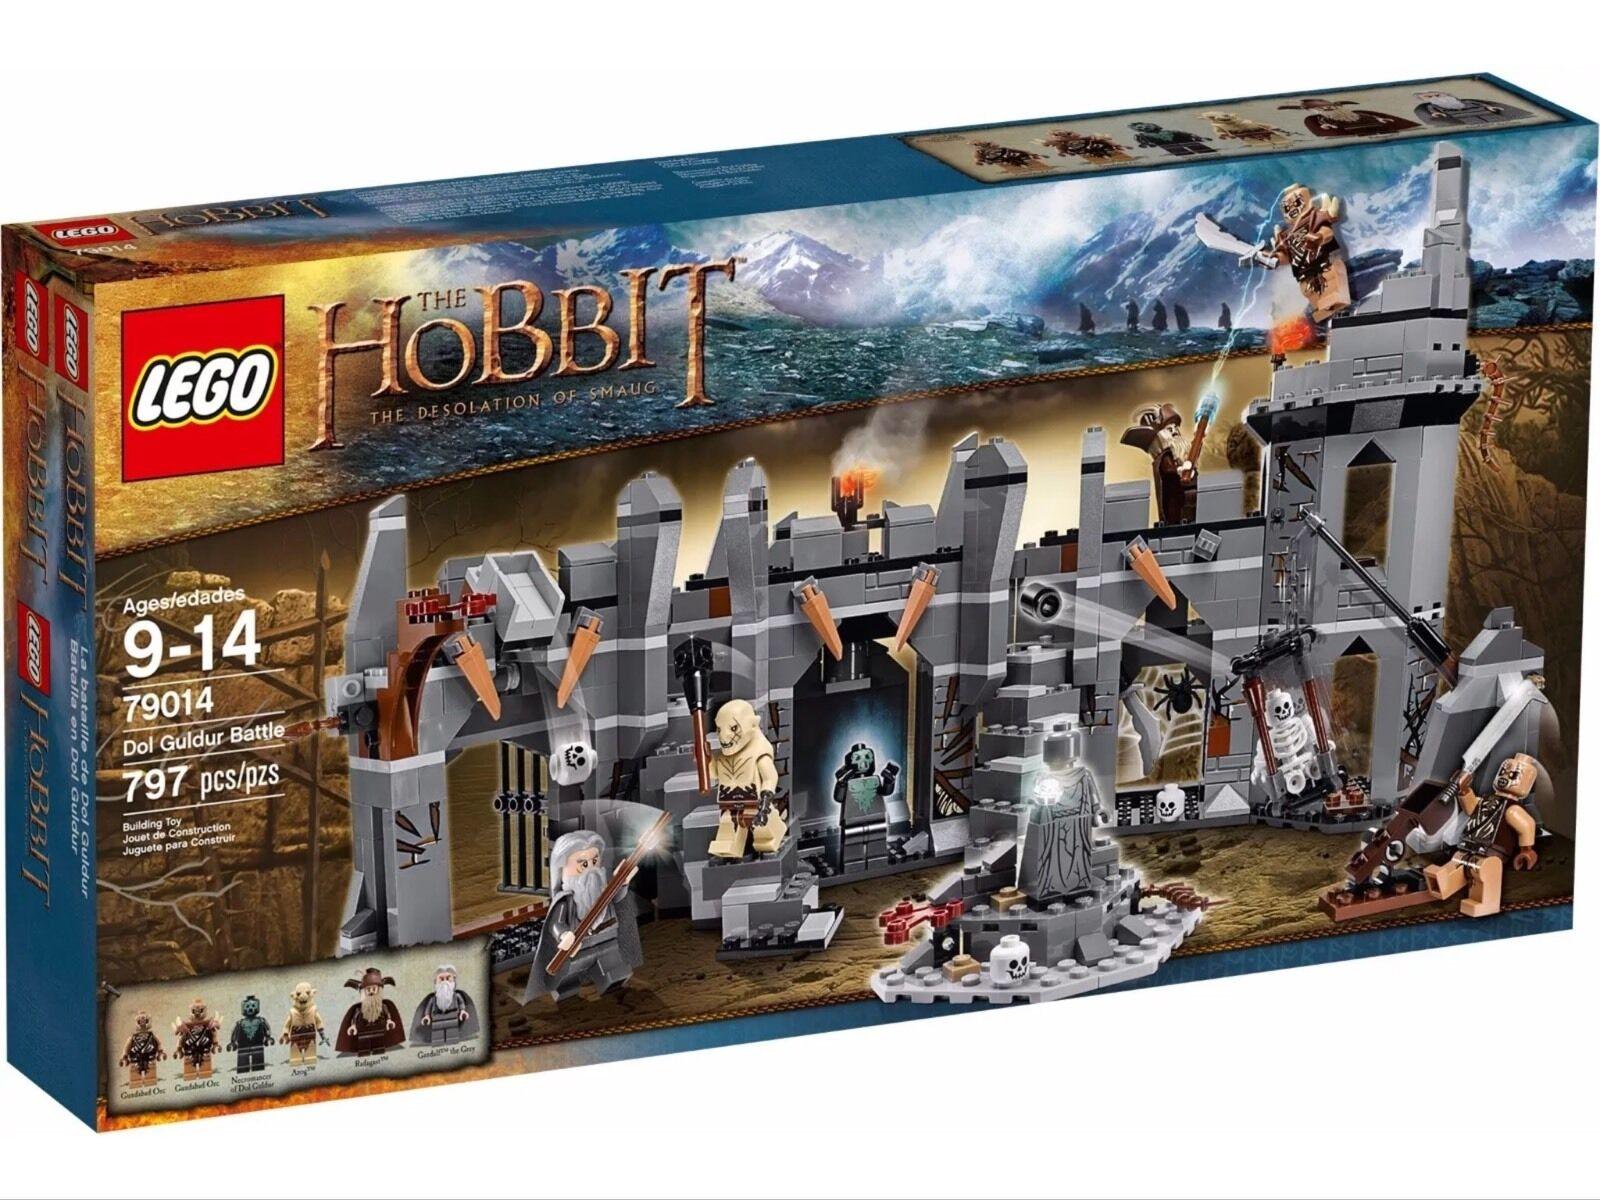 LEGO The Hobbit 79014 Dol Guldur battle New Sealed Retirot